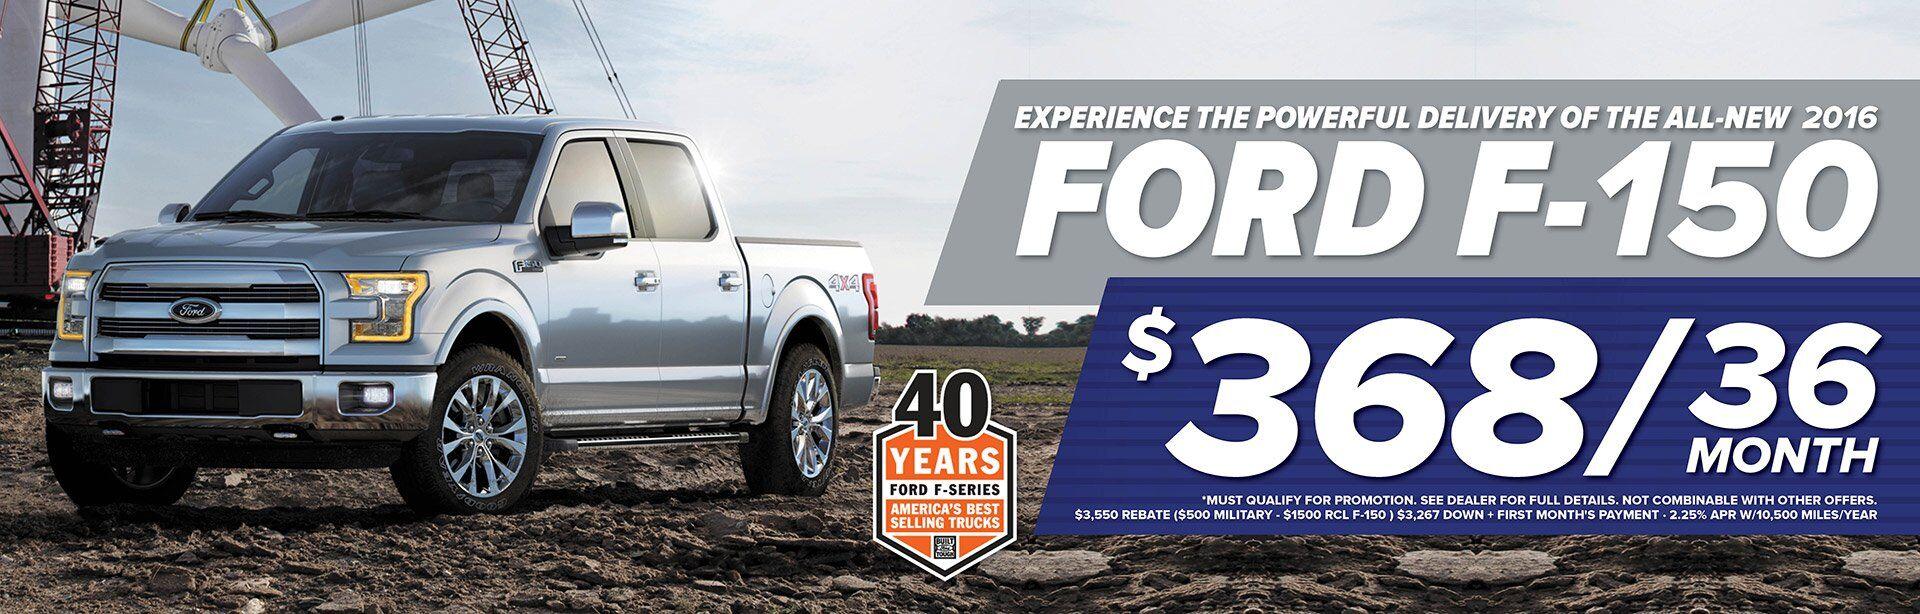 Ford Truck Incentives Ford Dealership Rio Grande City Tx Used Cars Payne Rio Grande City